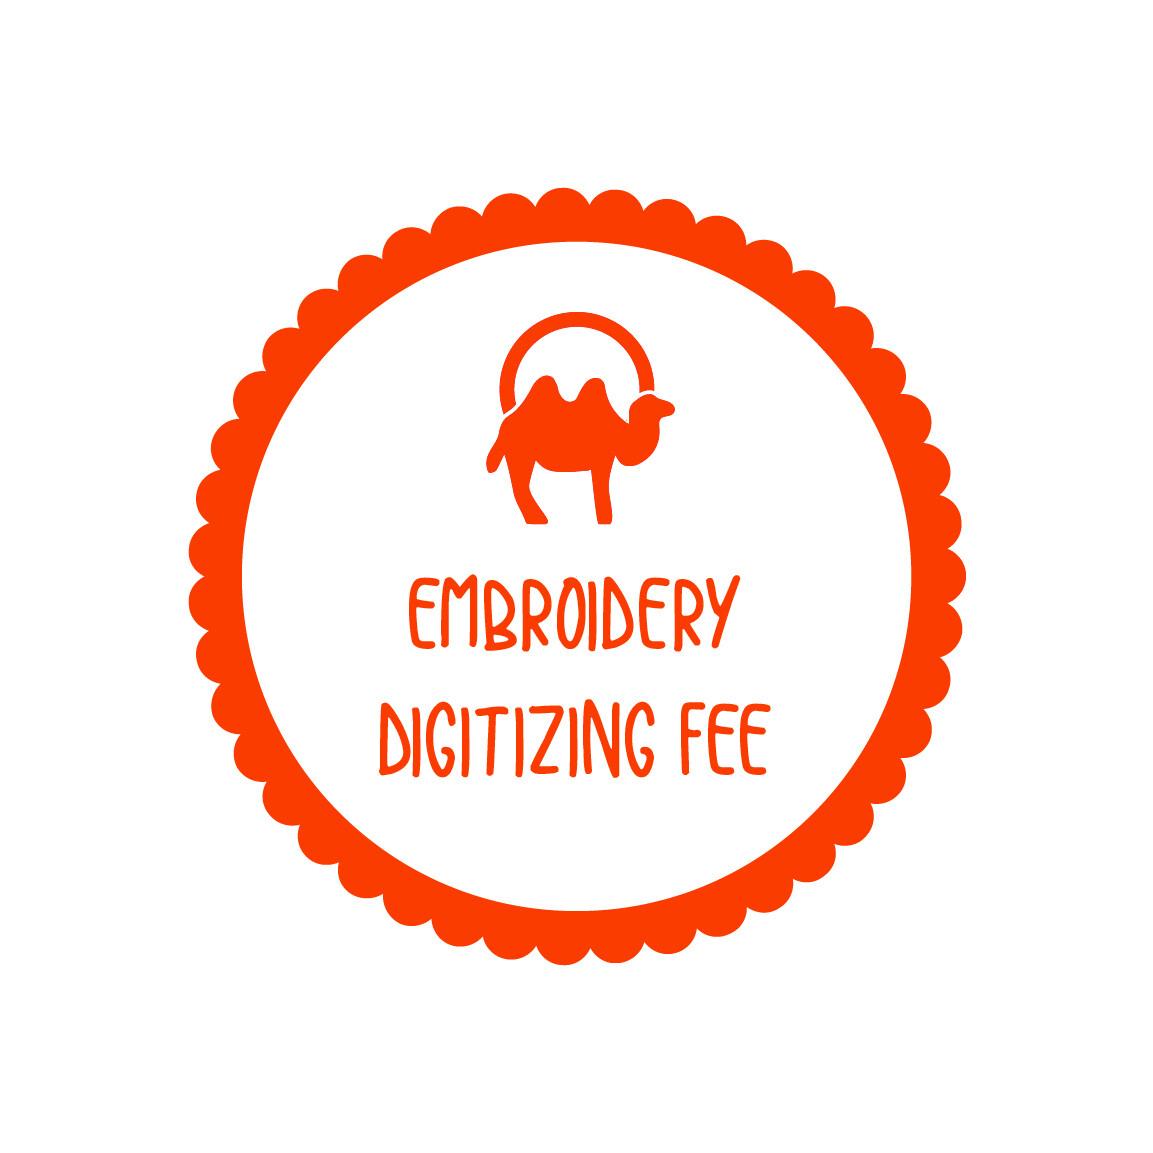 Logo Digitizing Fee for Embroidery